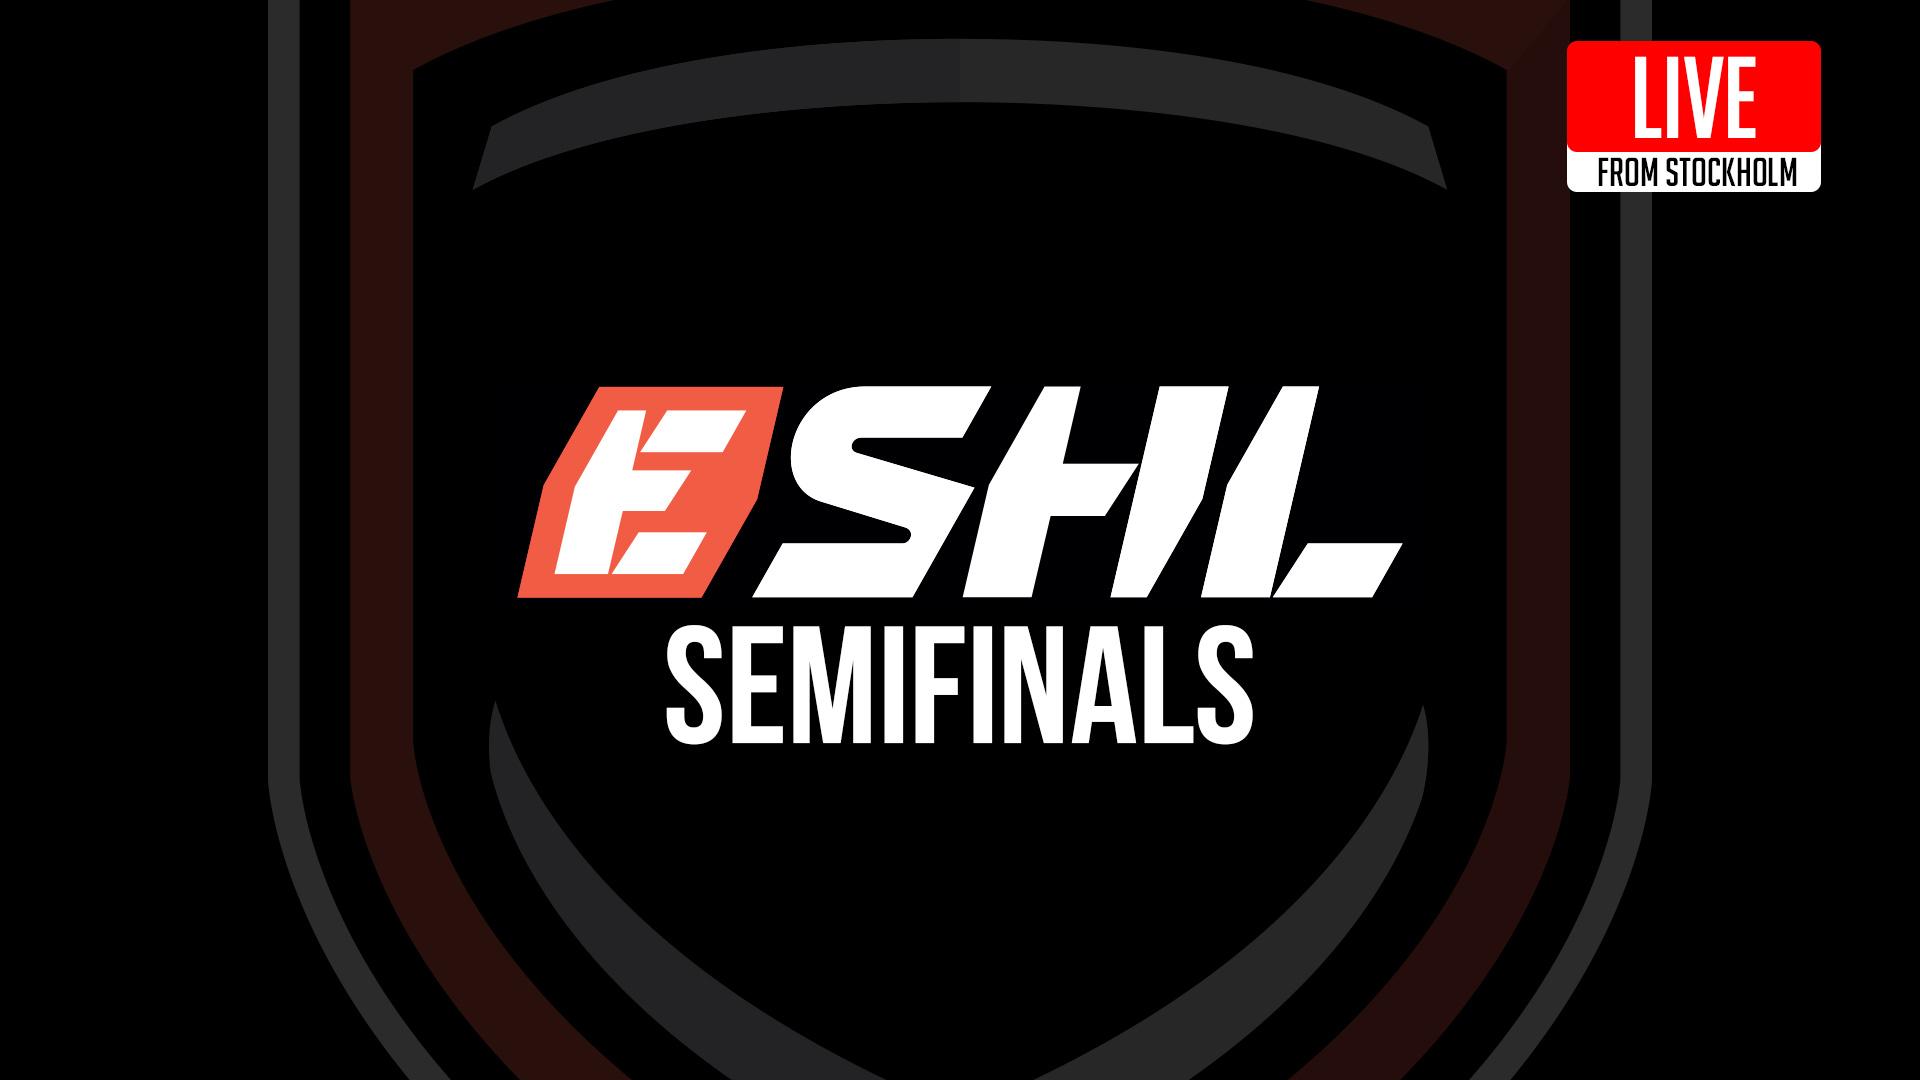 eSHL_Semifinals_Live_from_Stockholm2.jpg